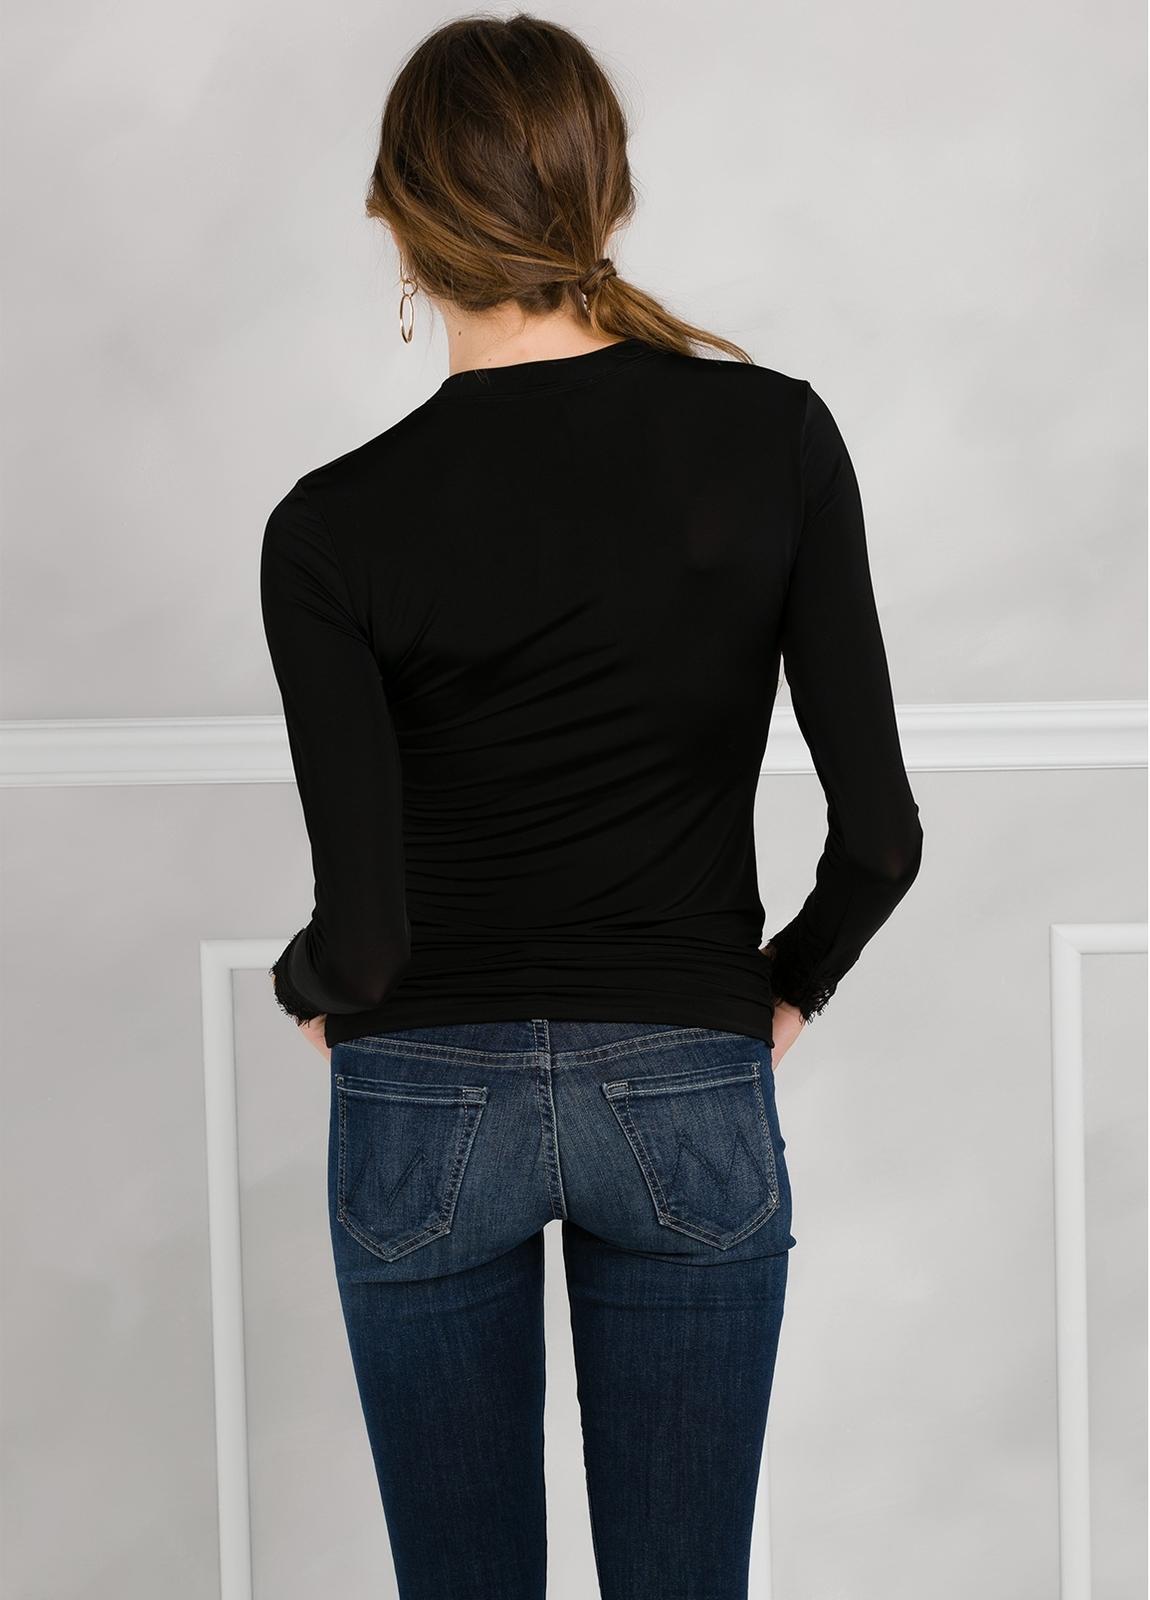 Camiseta woman manga larga con encaje en puños, color negro - Ítem1